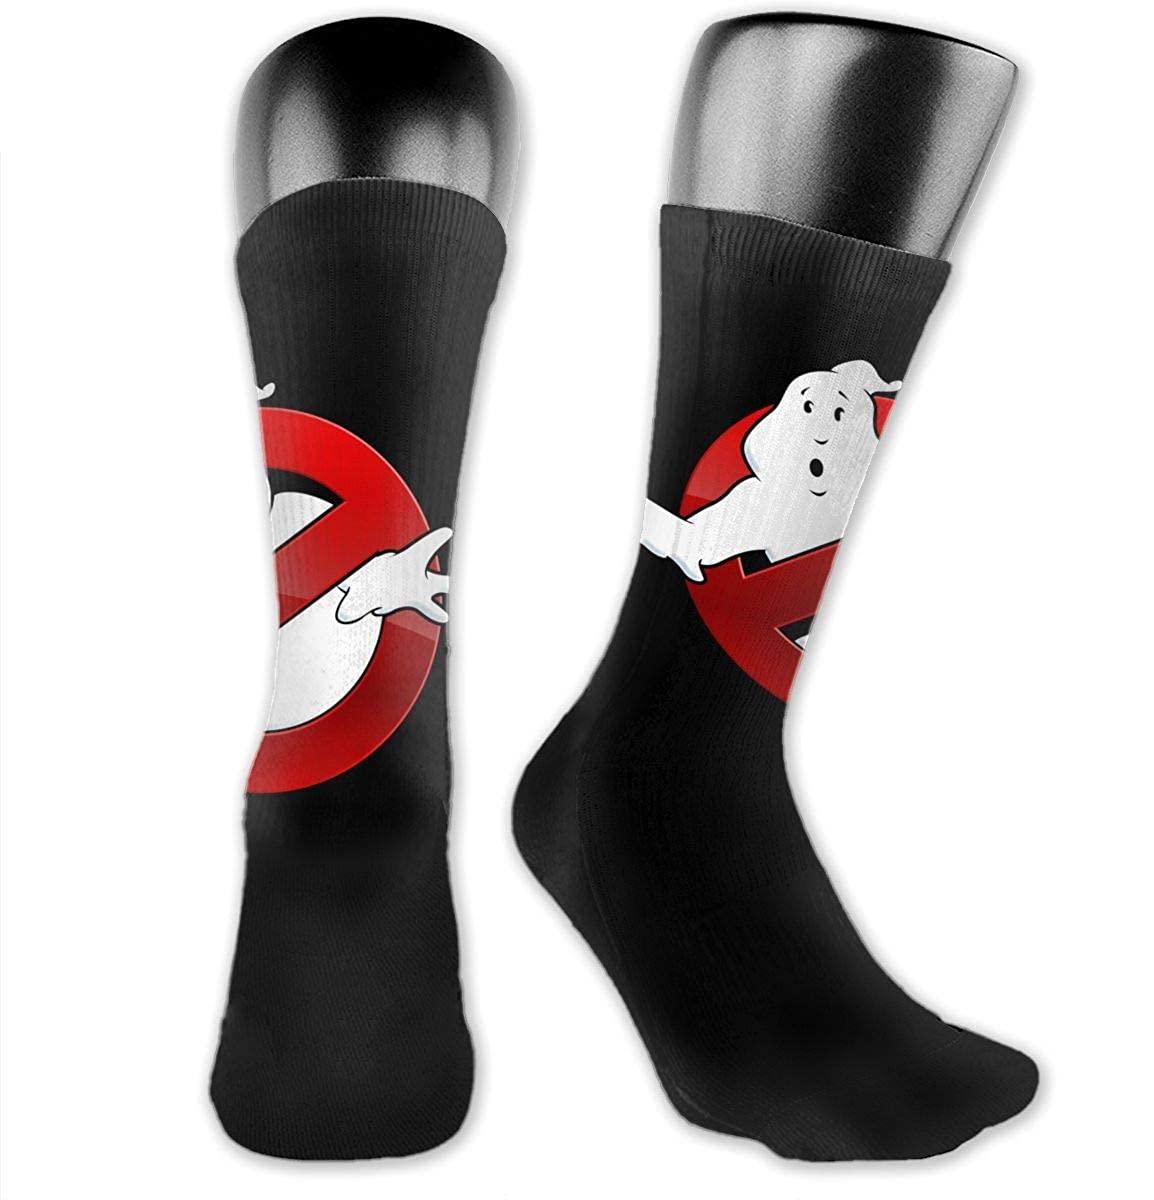 Geek Ghostbusters Medium Long Socks Dress Hose Novelty Short Anklet For Training